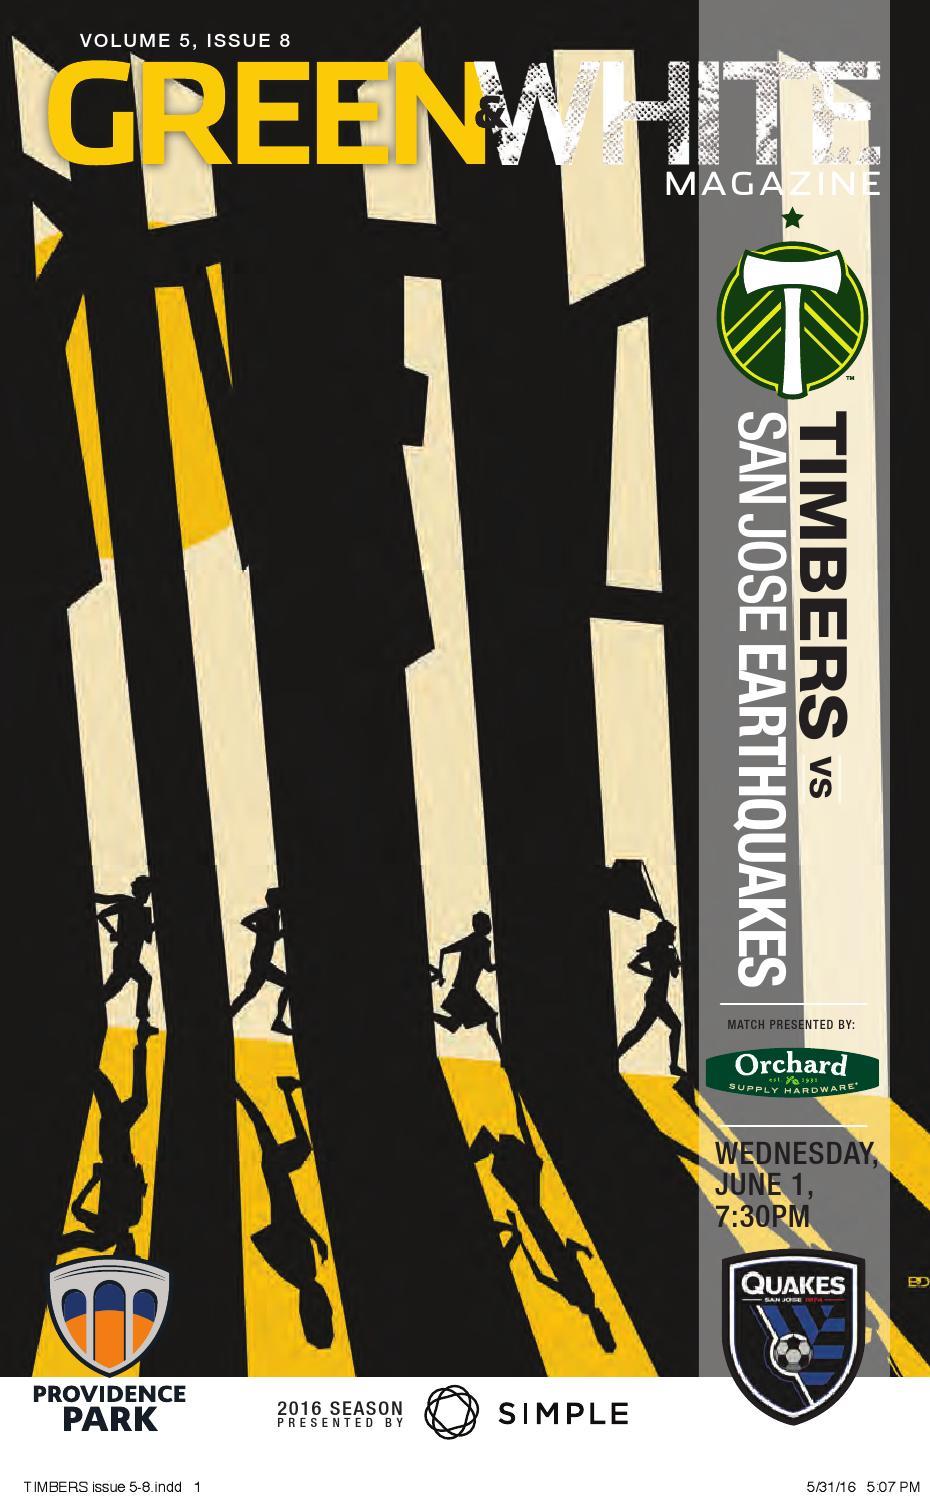 Captain Jack Lounge Stoel.Green White Magazine Portland Timbers Vs San Jose Earthquakes